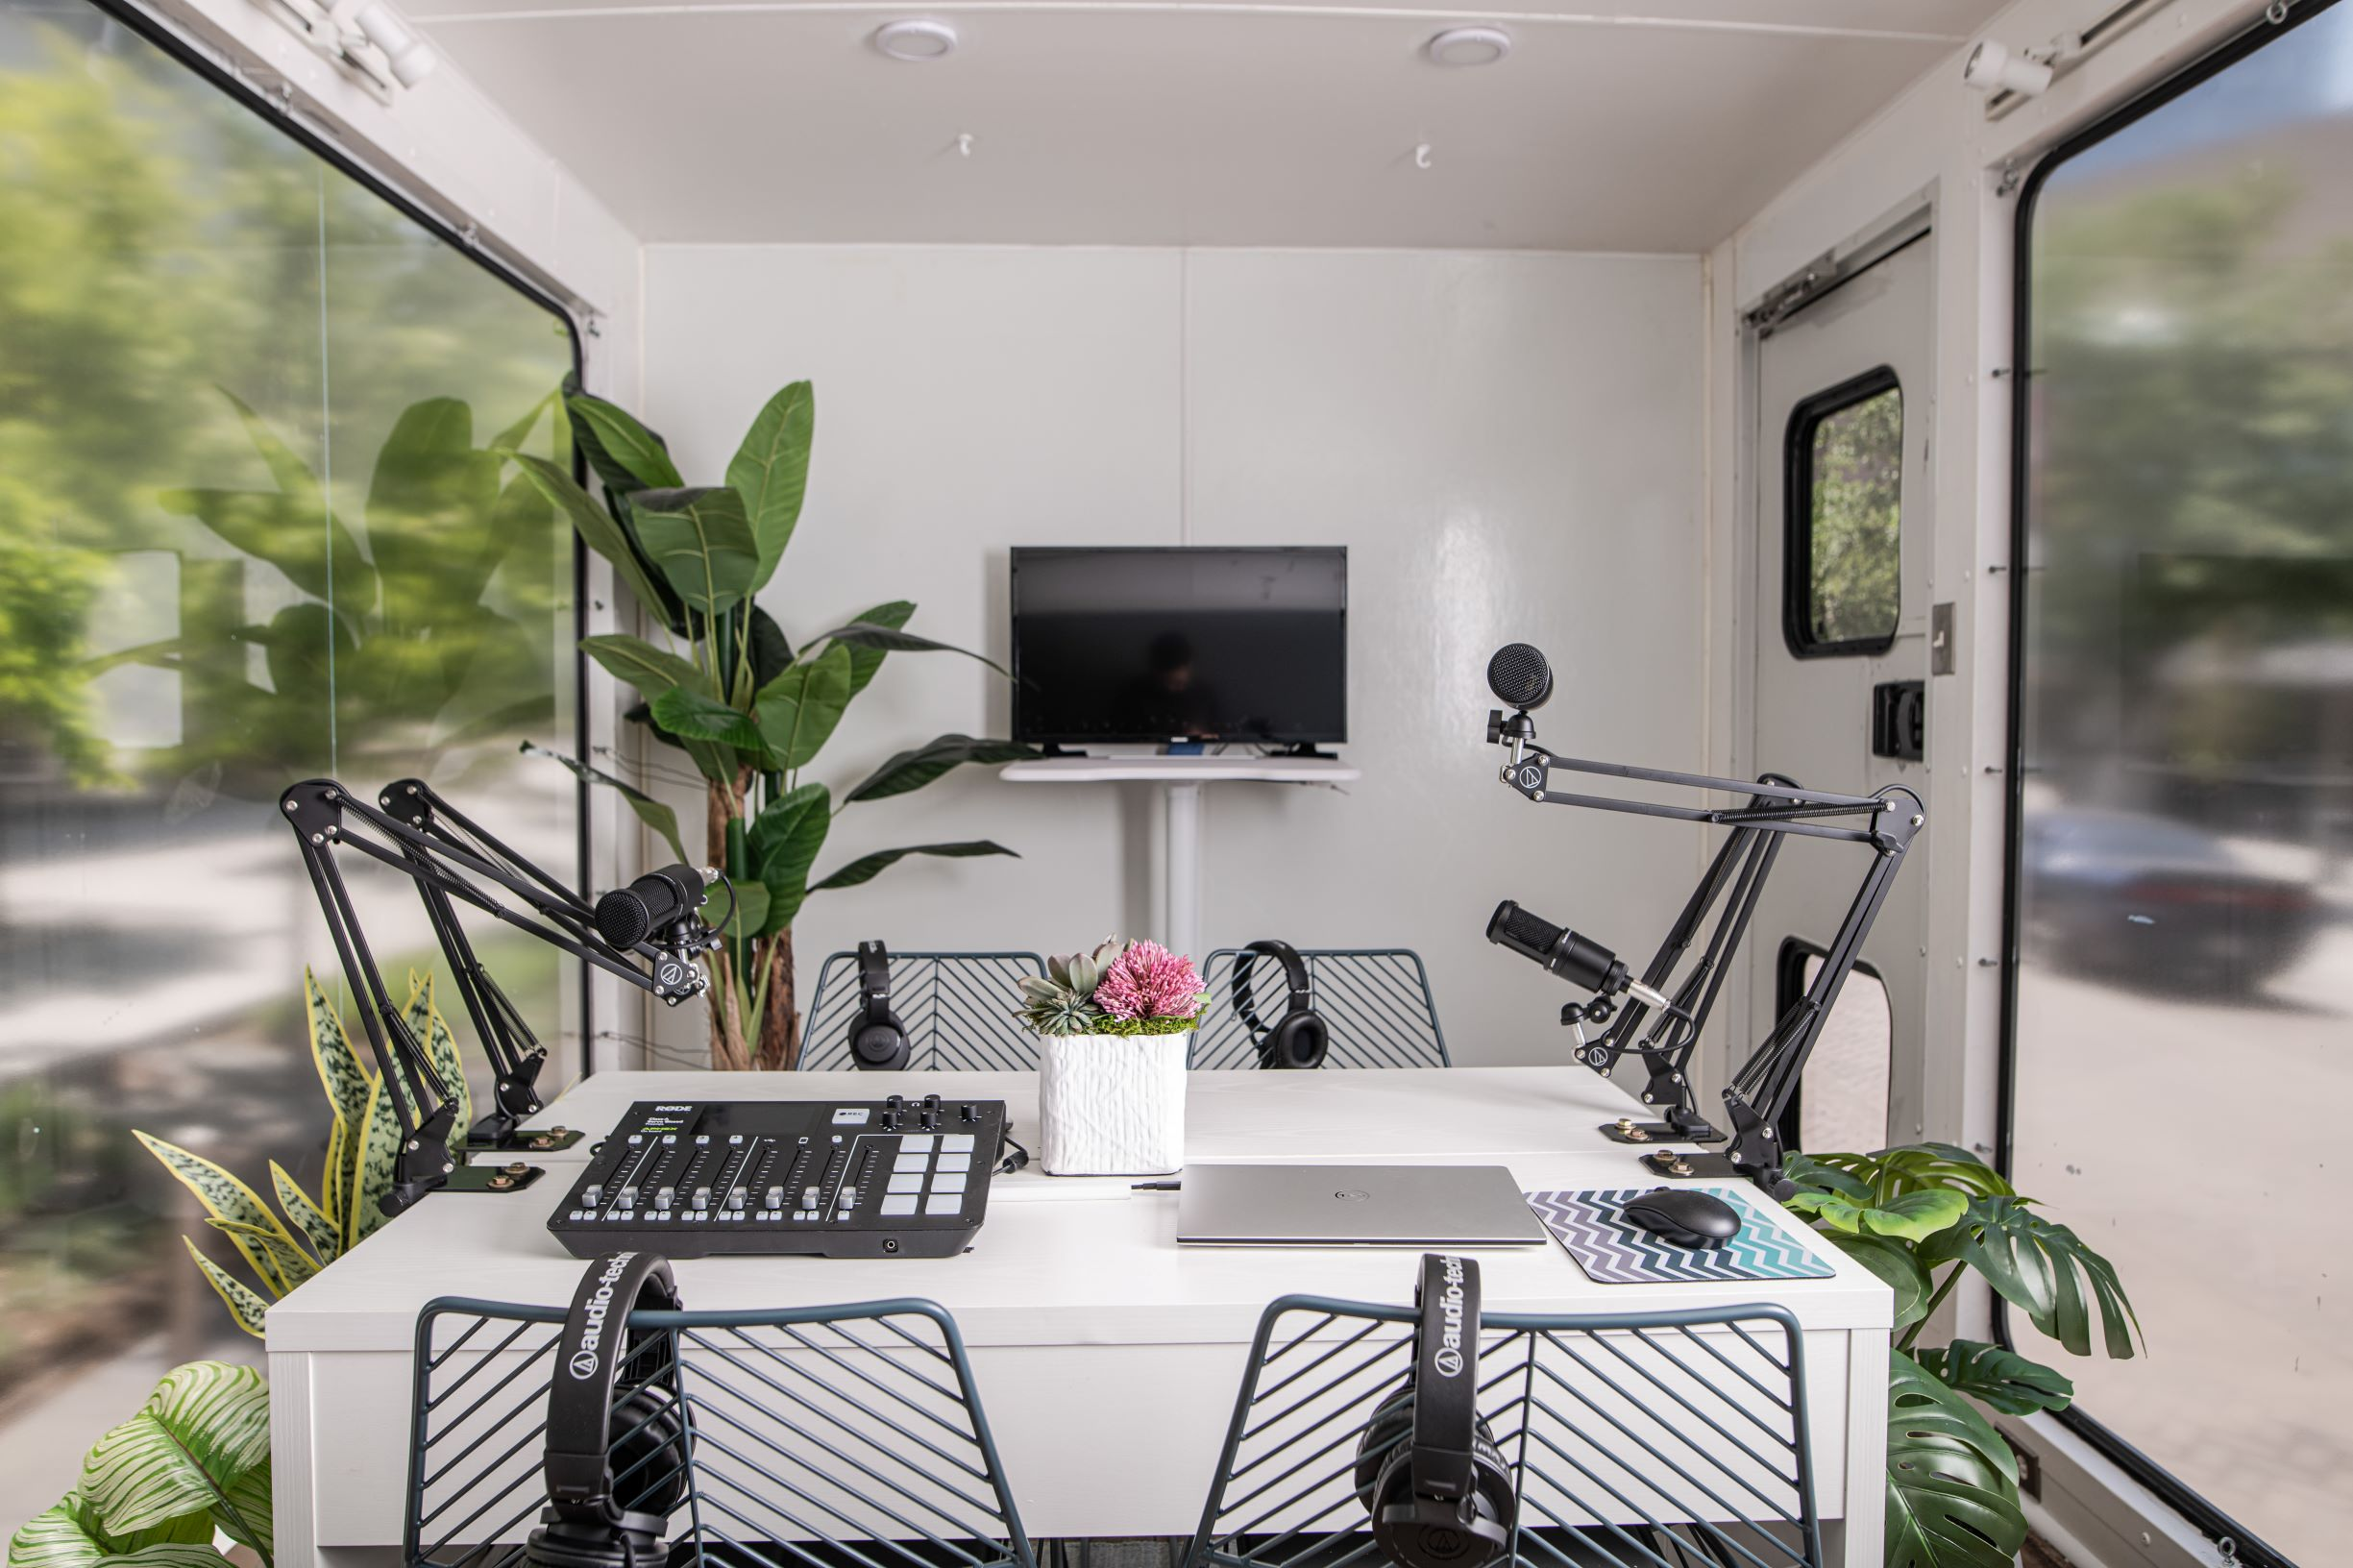 The JOY Podcast Studio